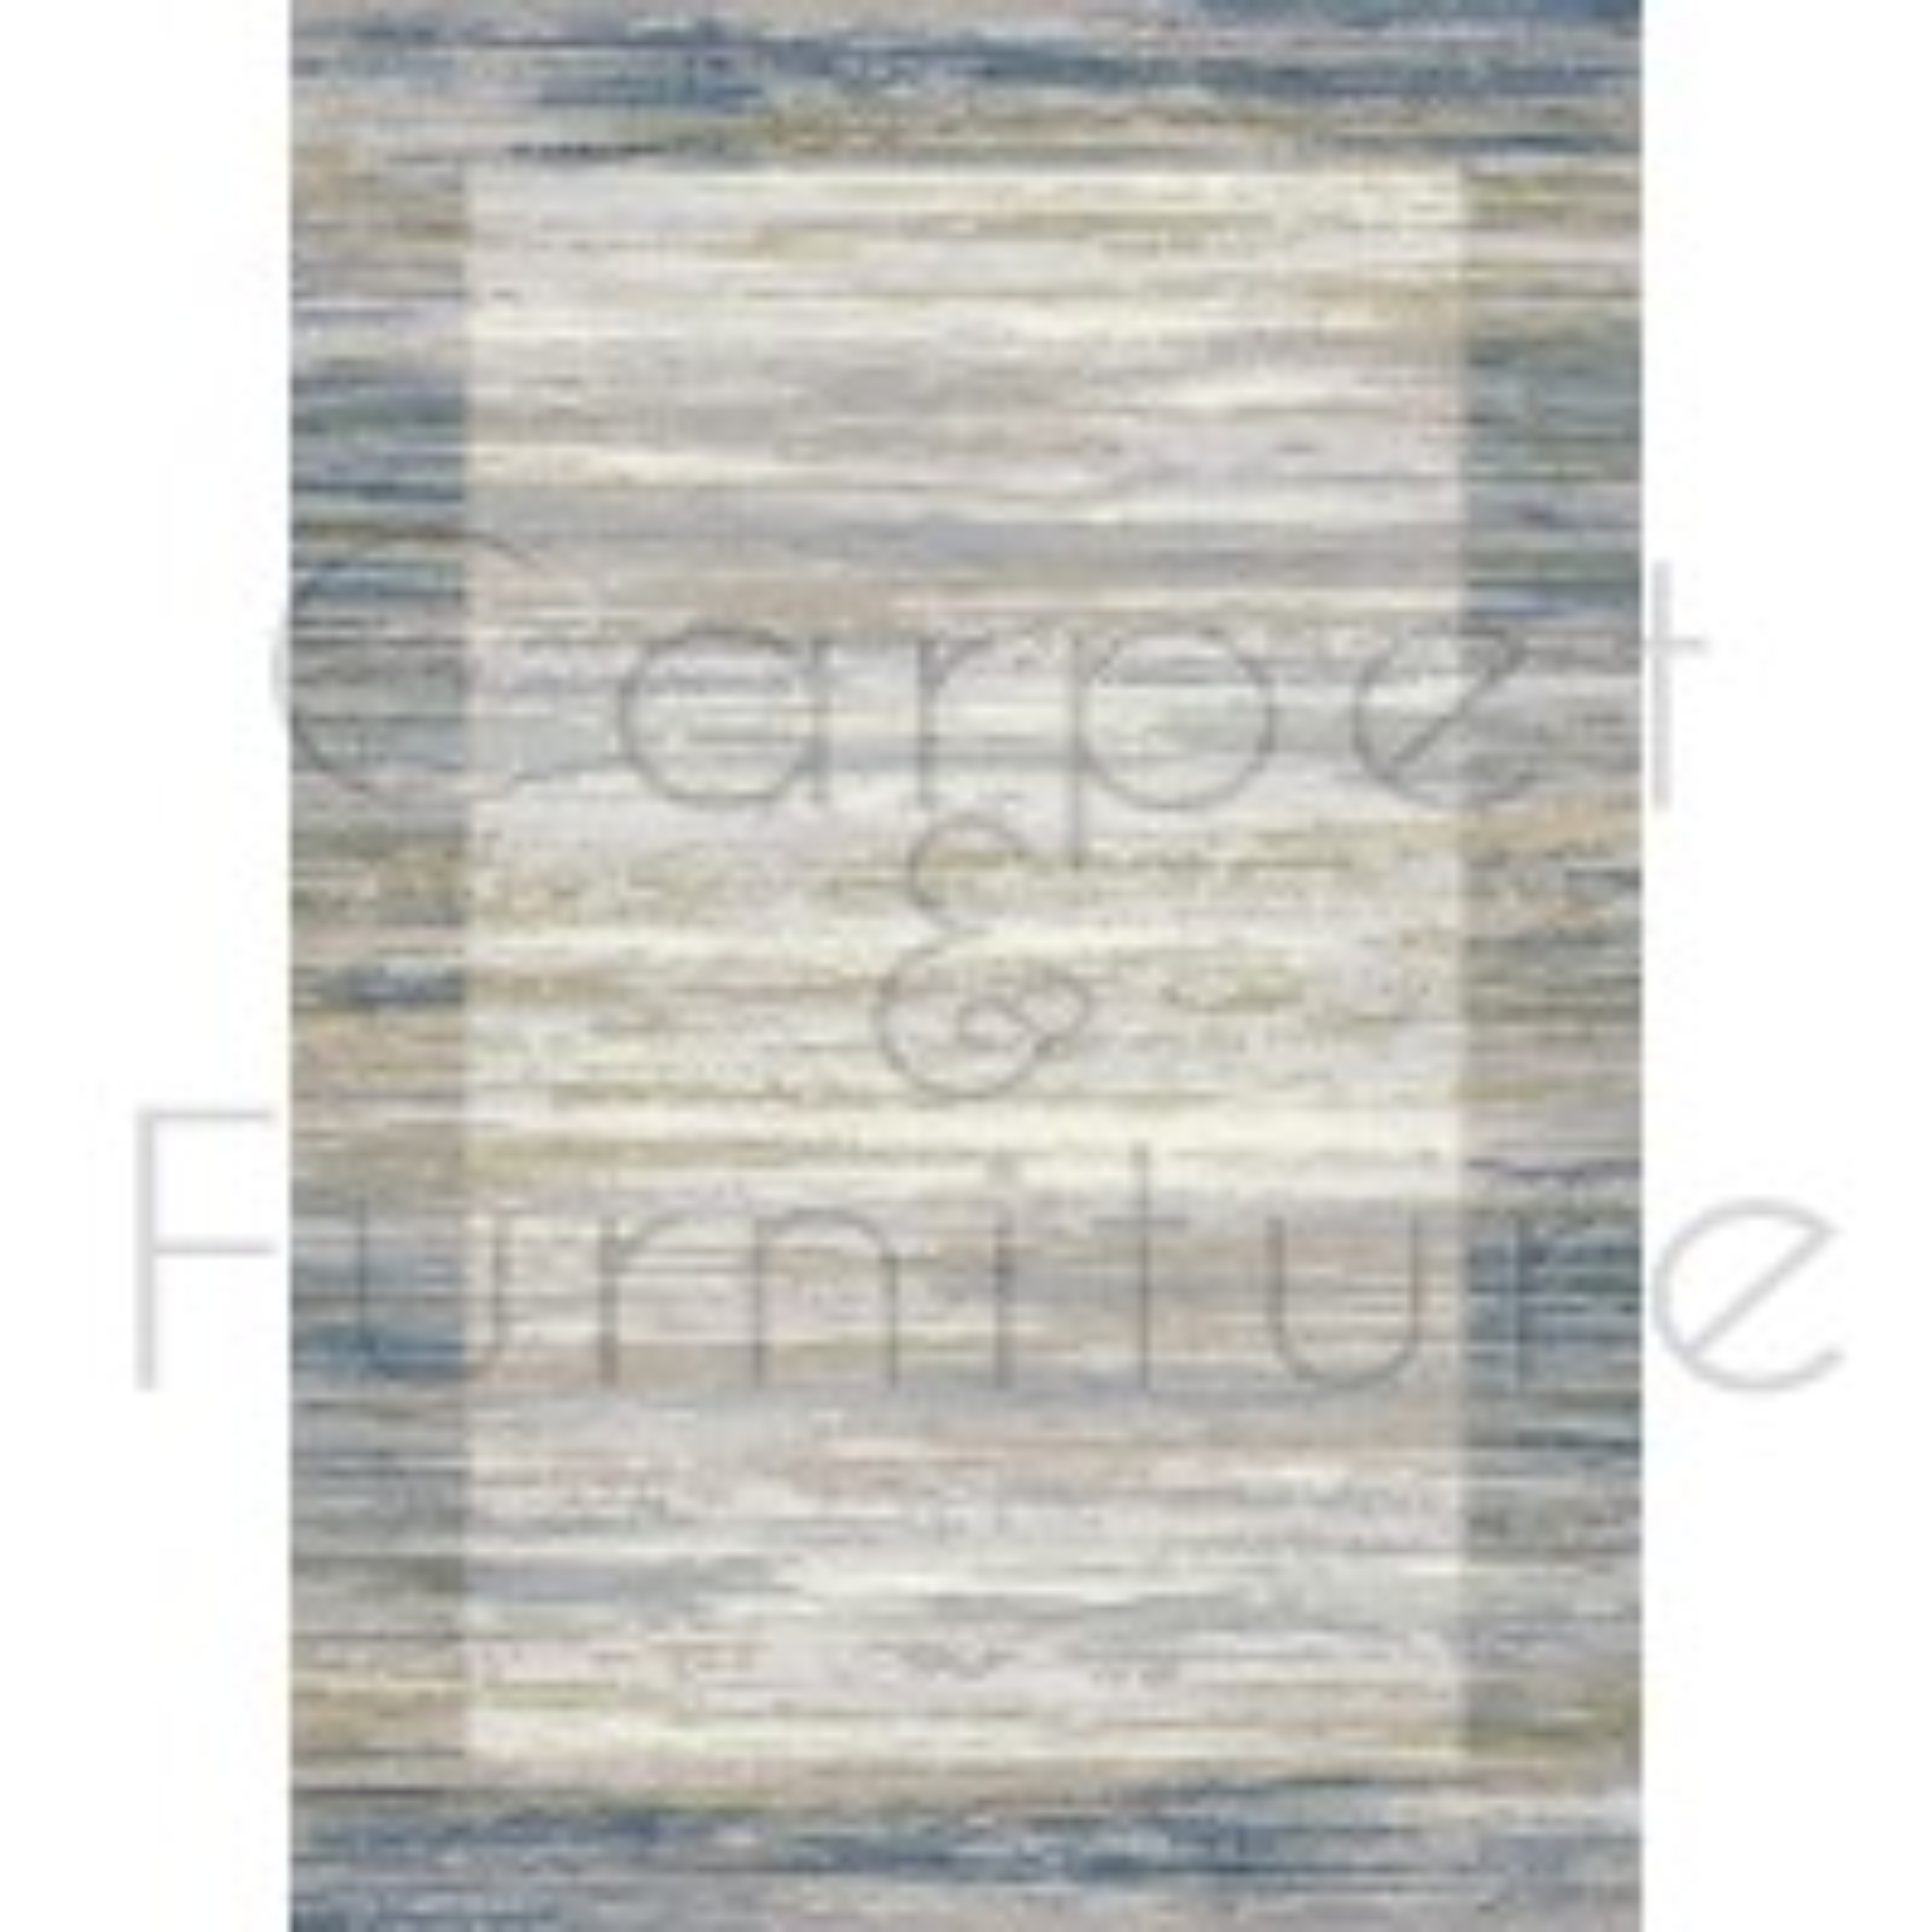 "Galleria Rug - Border Blue 63138 6191 - Size 240 x 330 cm (7'10"" x 10'10"")"